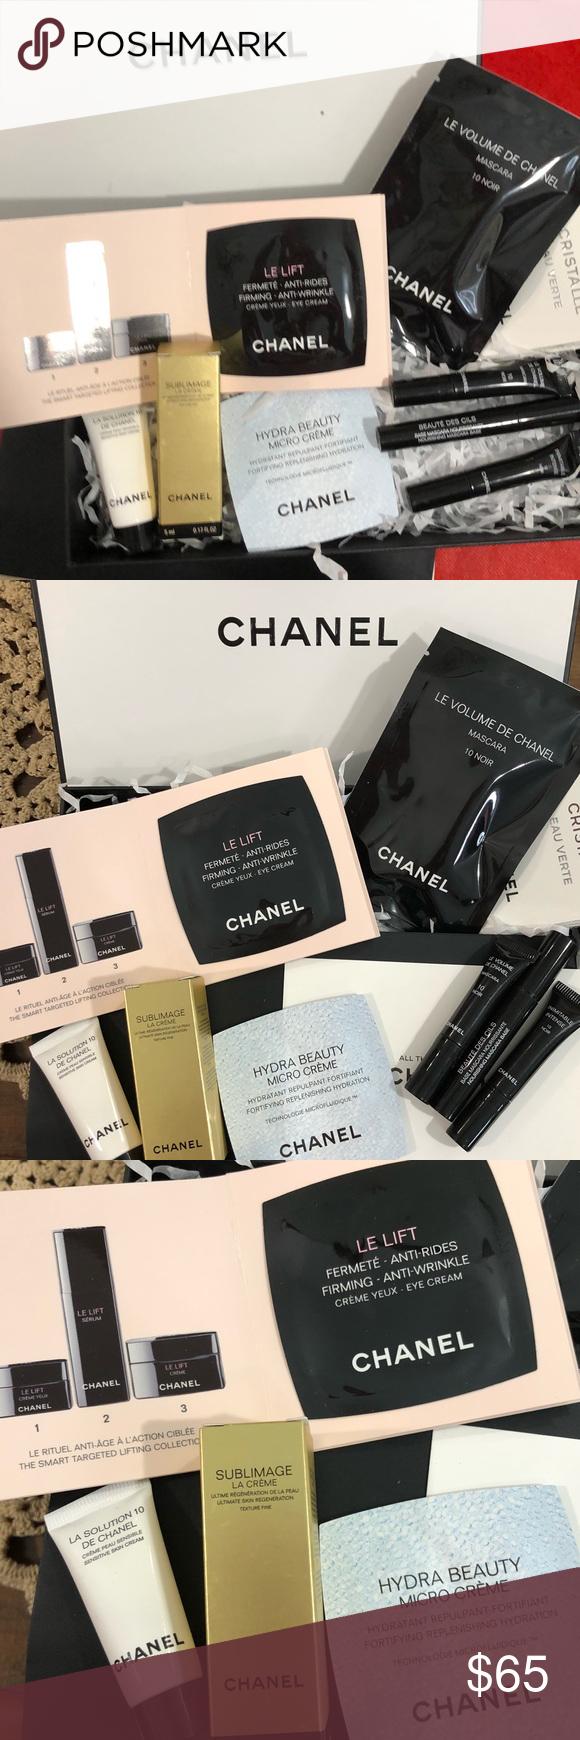 3e7ebd3c9b1b Chanel deluxe 📵Price Firm📵 Chanel new high end samples includes: 1  Sublimage la creme skin regeneration, 1 La Solution skin cream, 1 Hydra  Beauty Micro ...